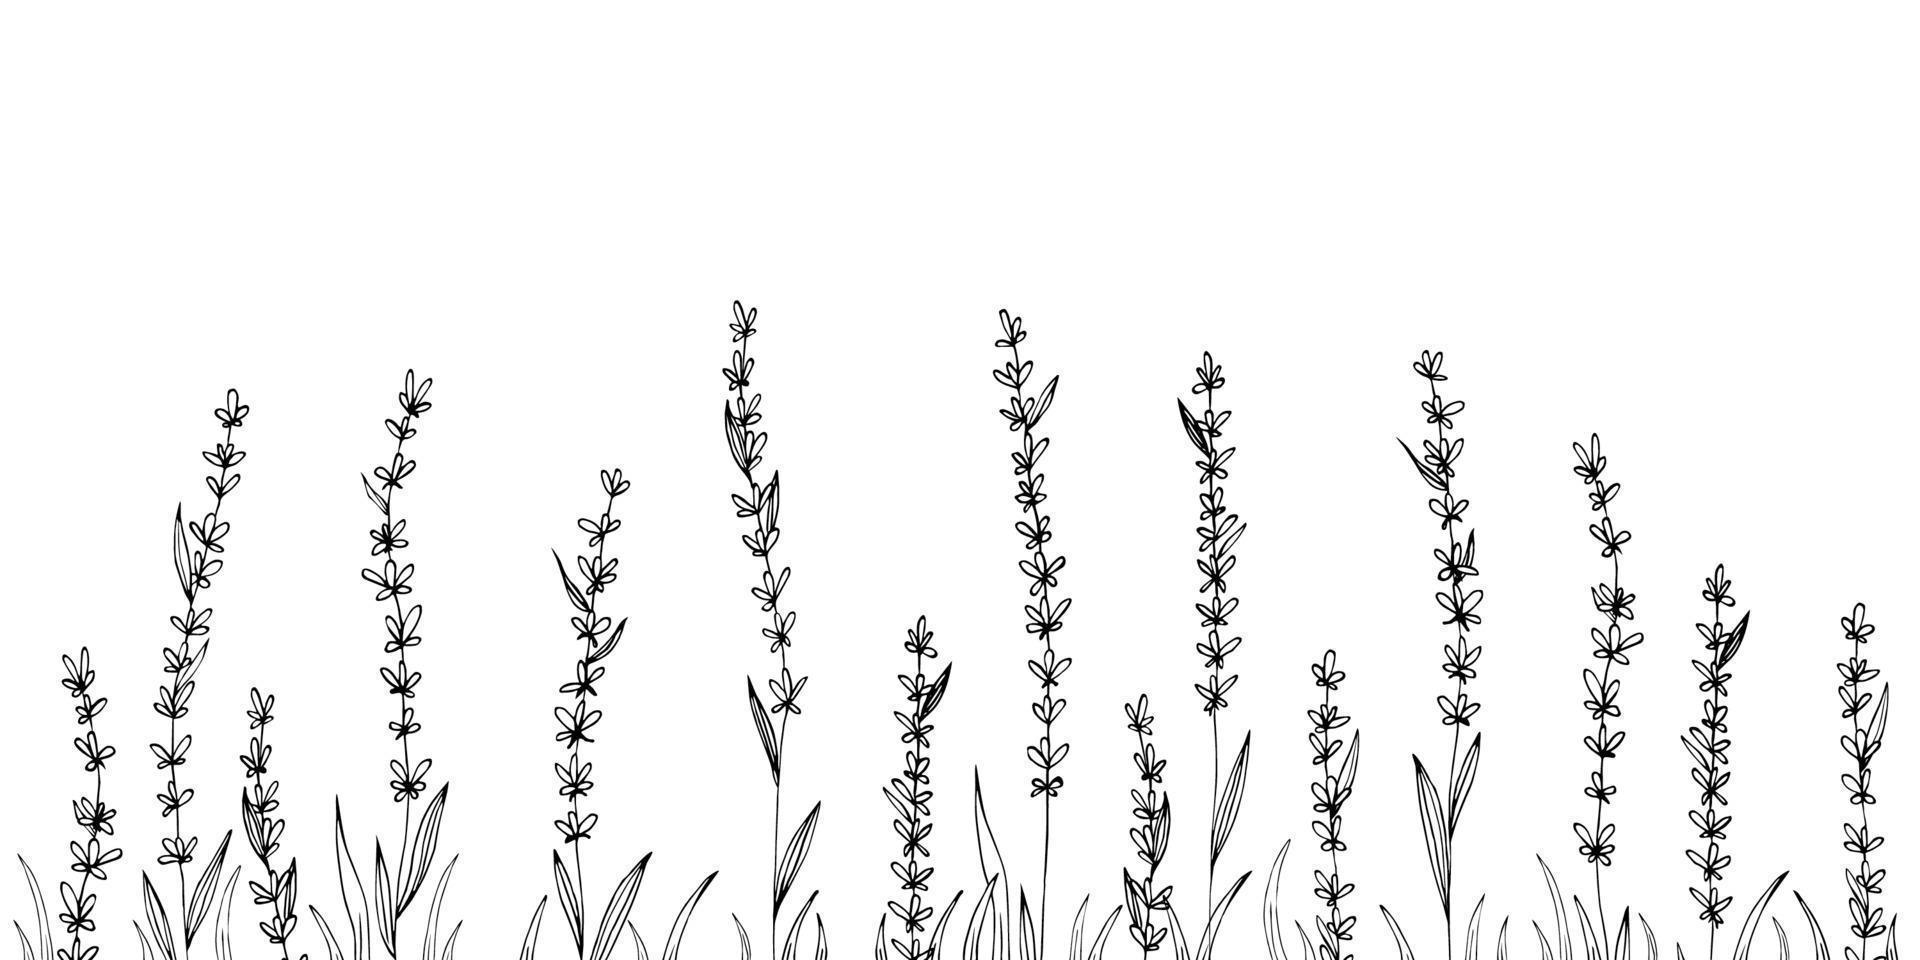 vector lavanda mão desenhada illustration.medical plant.